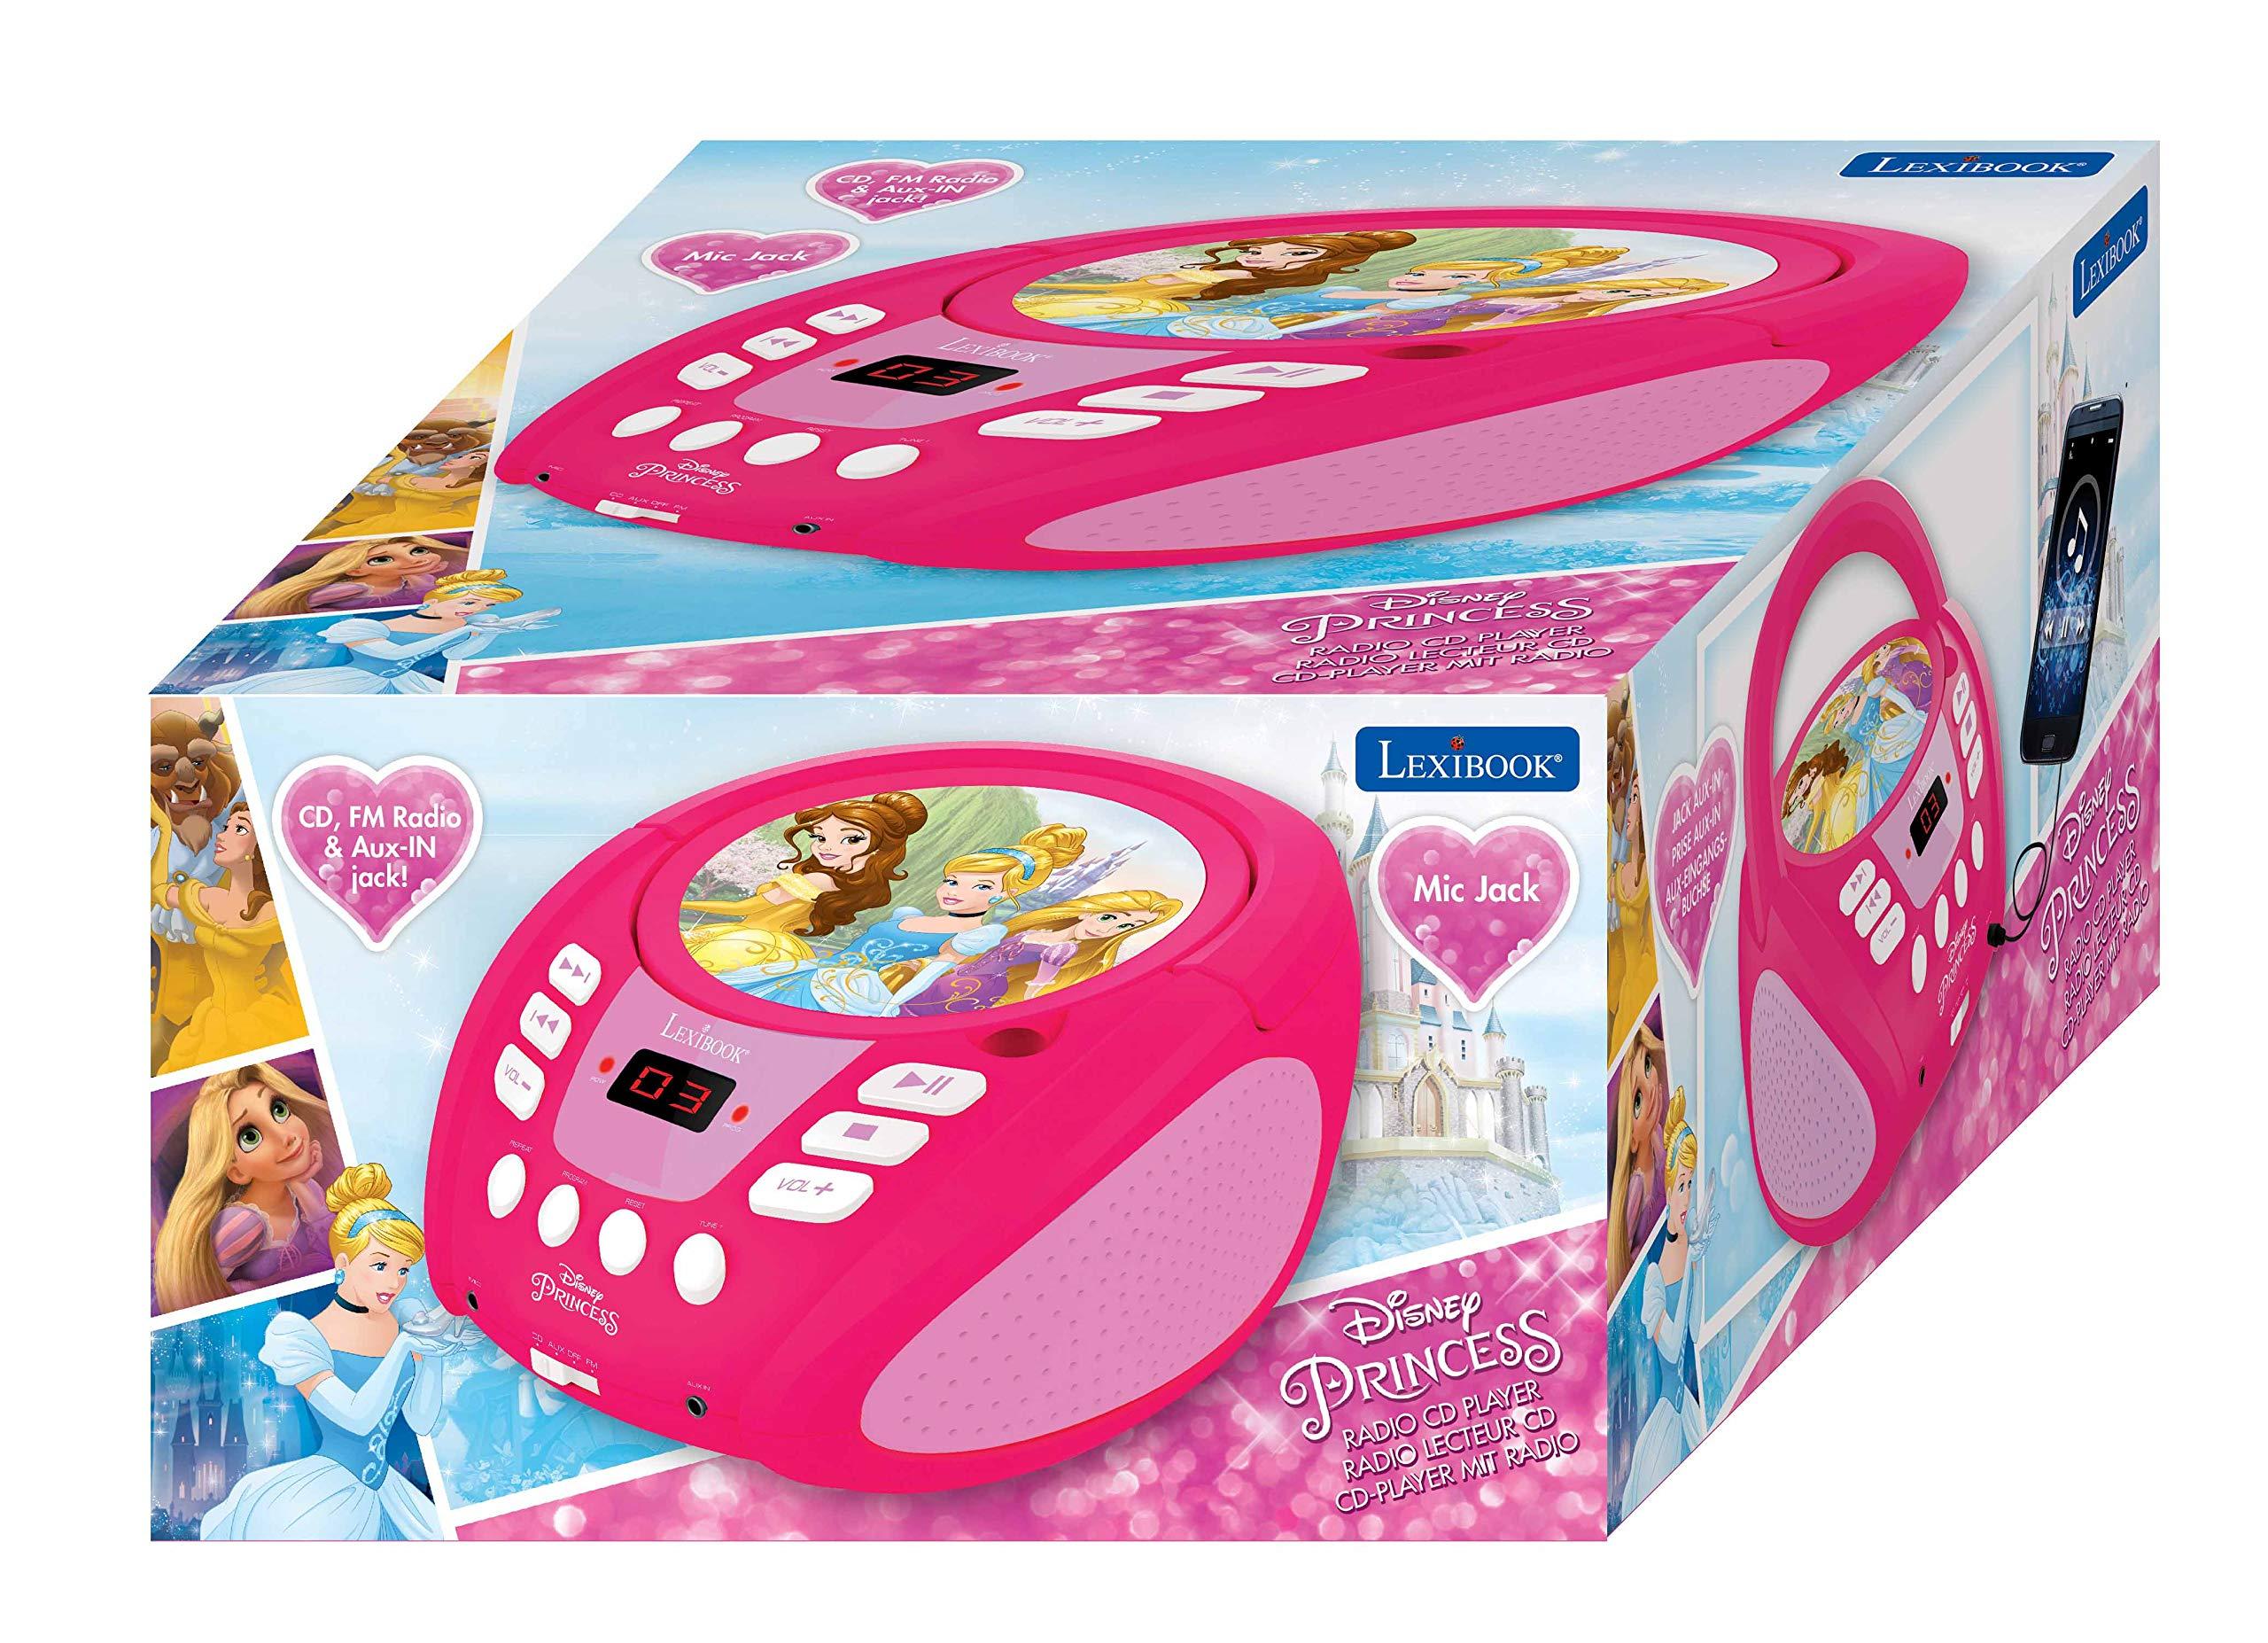 LEXiBOOK Disney Princess Boombox Radio CD Player by LEXiBOOK (Image #6)